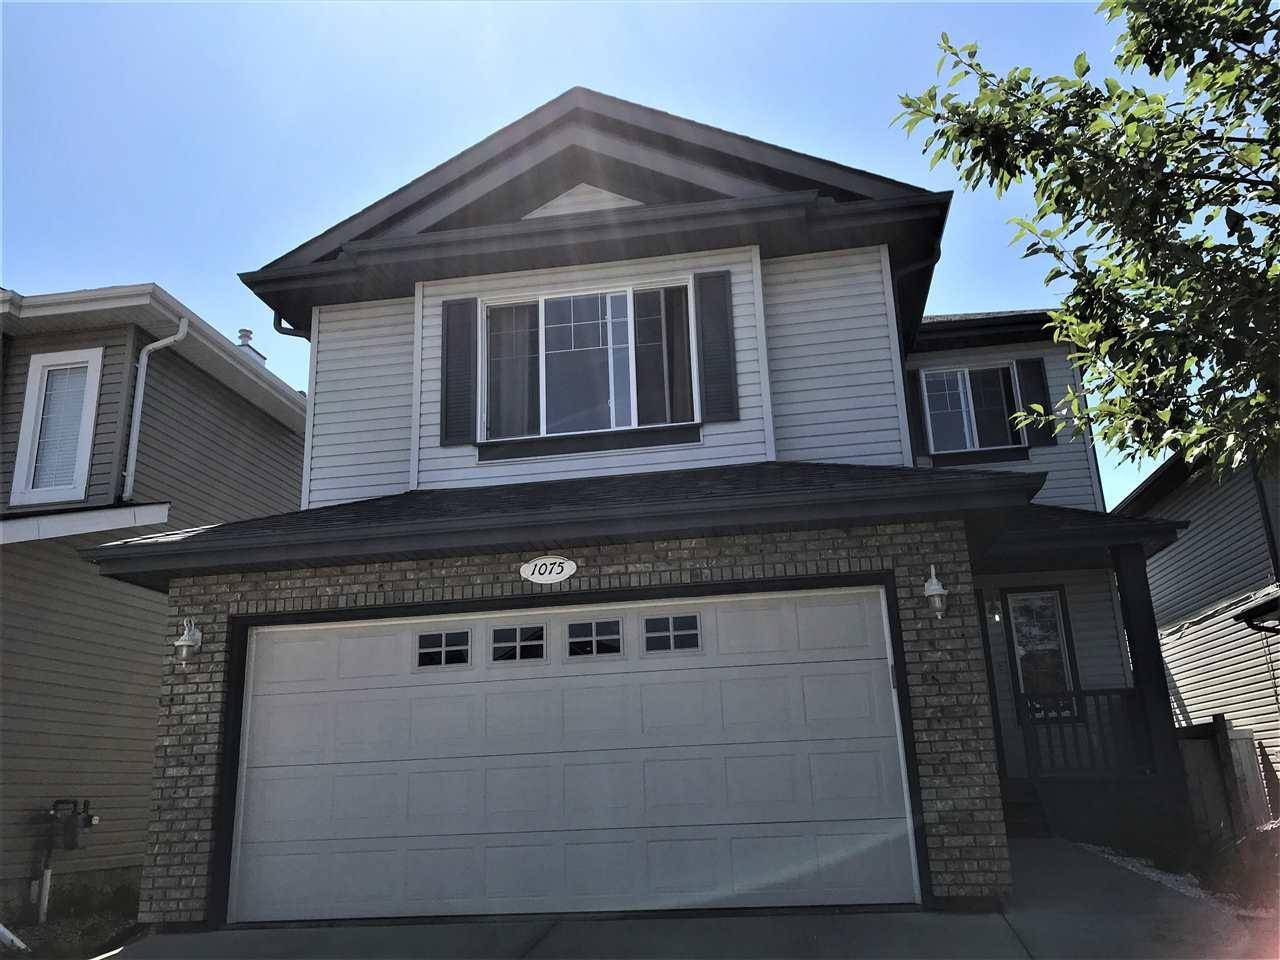 House for sale at 1075 Leger Blvd Nw Edmonton Alberta - MLS: E4167107